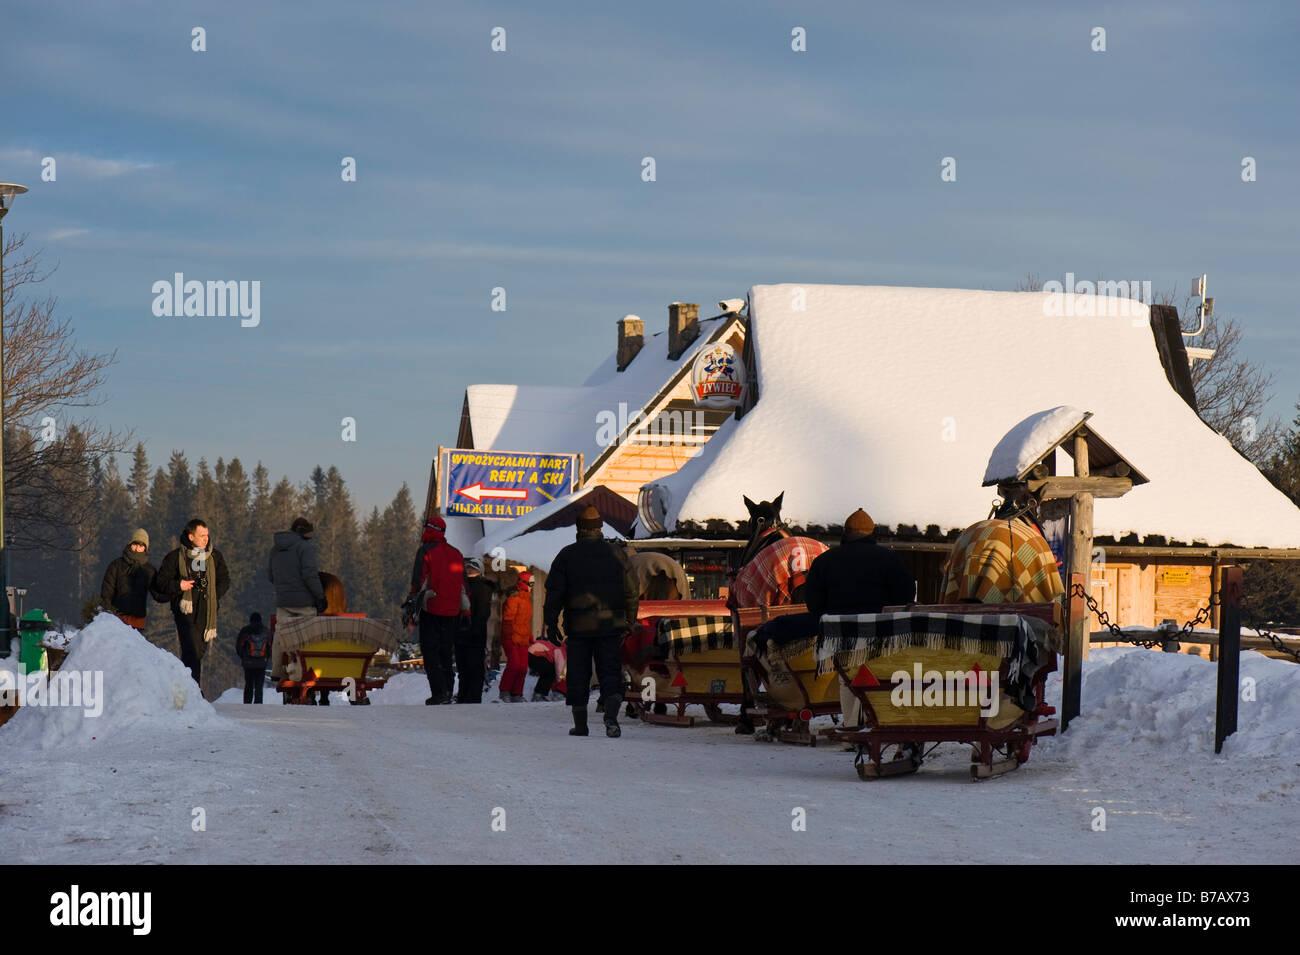 Horse drawn sleigh waiting for customers Gubalowka Hill Zakopane Tatra Mountains Podhale Region Poland - Stock Image